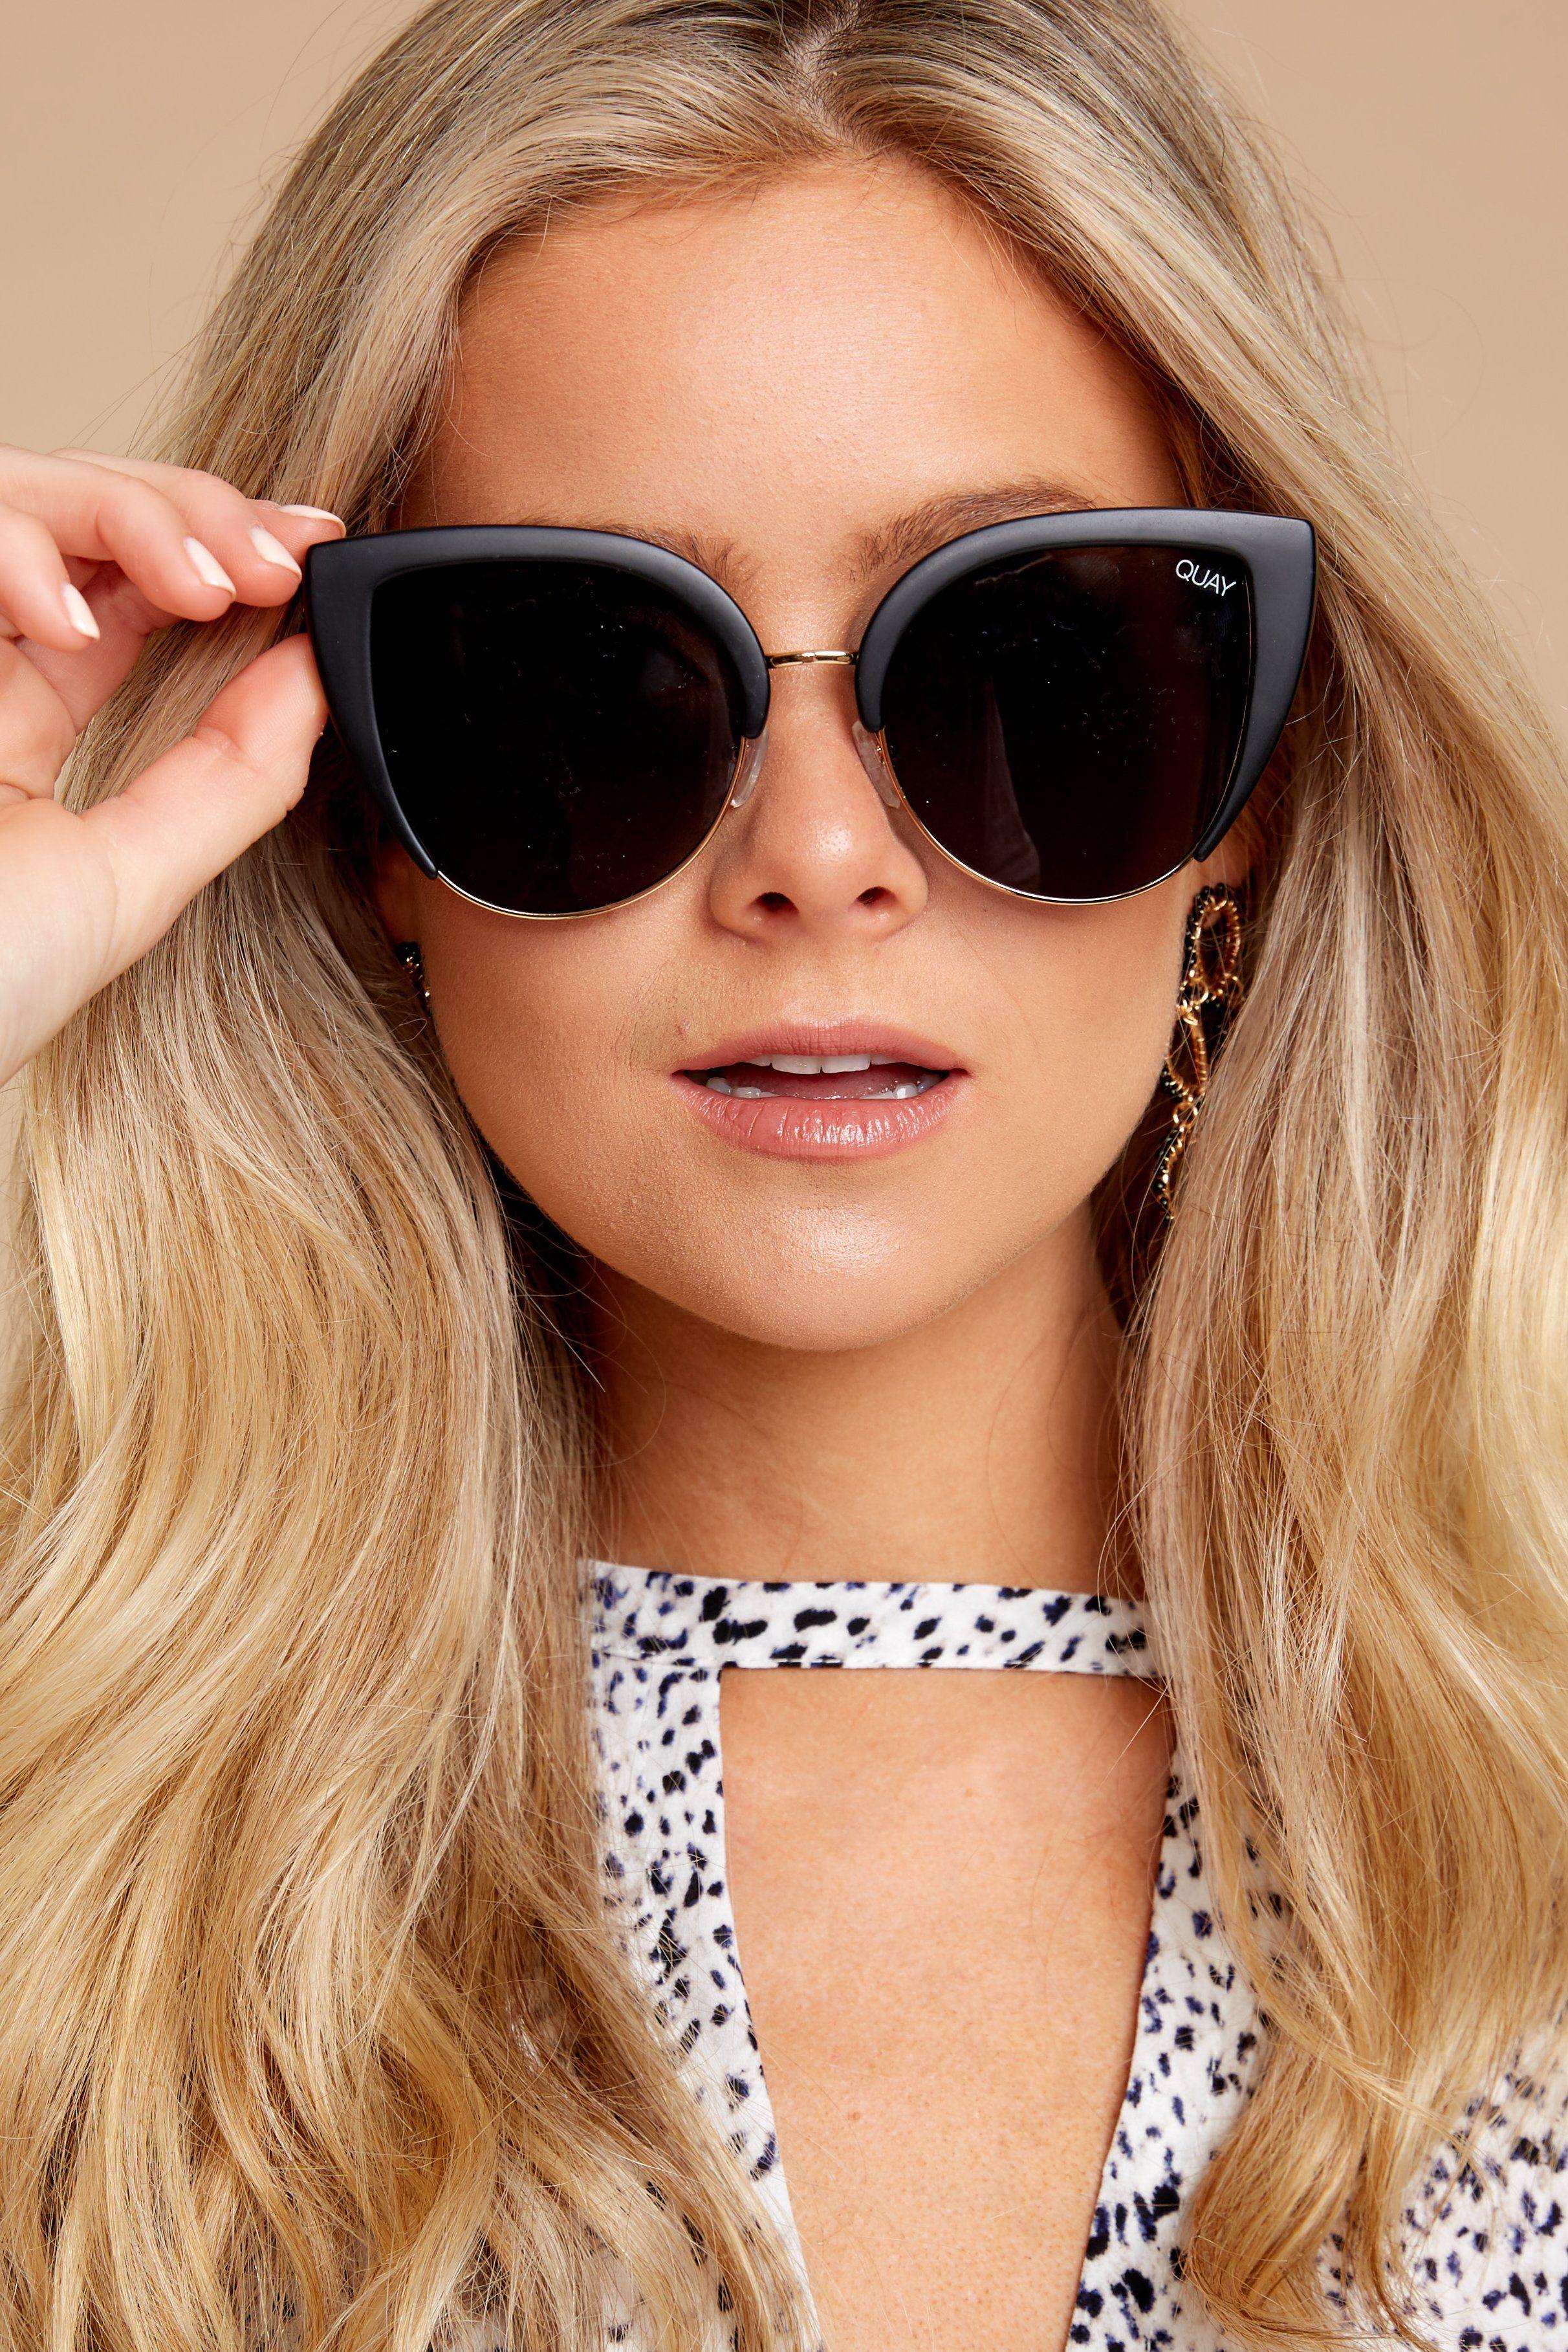 851cbdd30d Quay Australia Oh My Dayz Black Sunglasses - Trendy Sunglasses - Sunglasses  -  60.00 – Red Dress Boutique